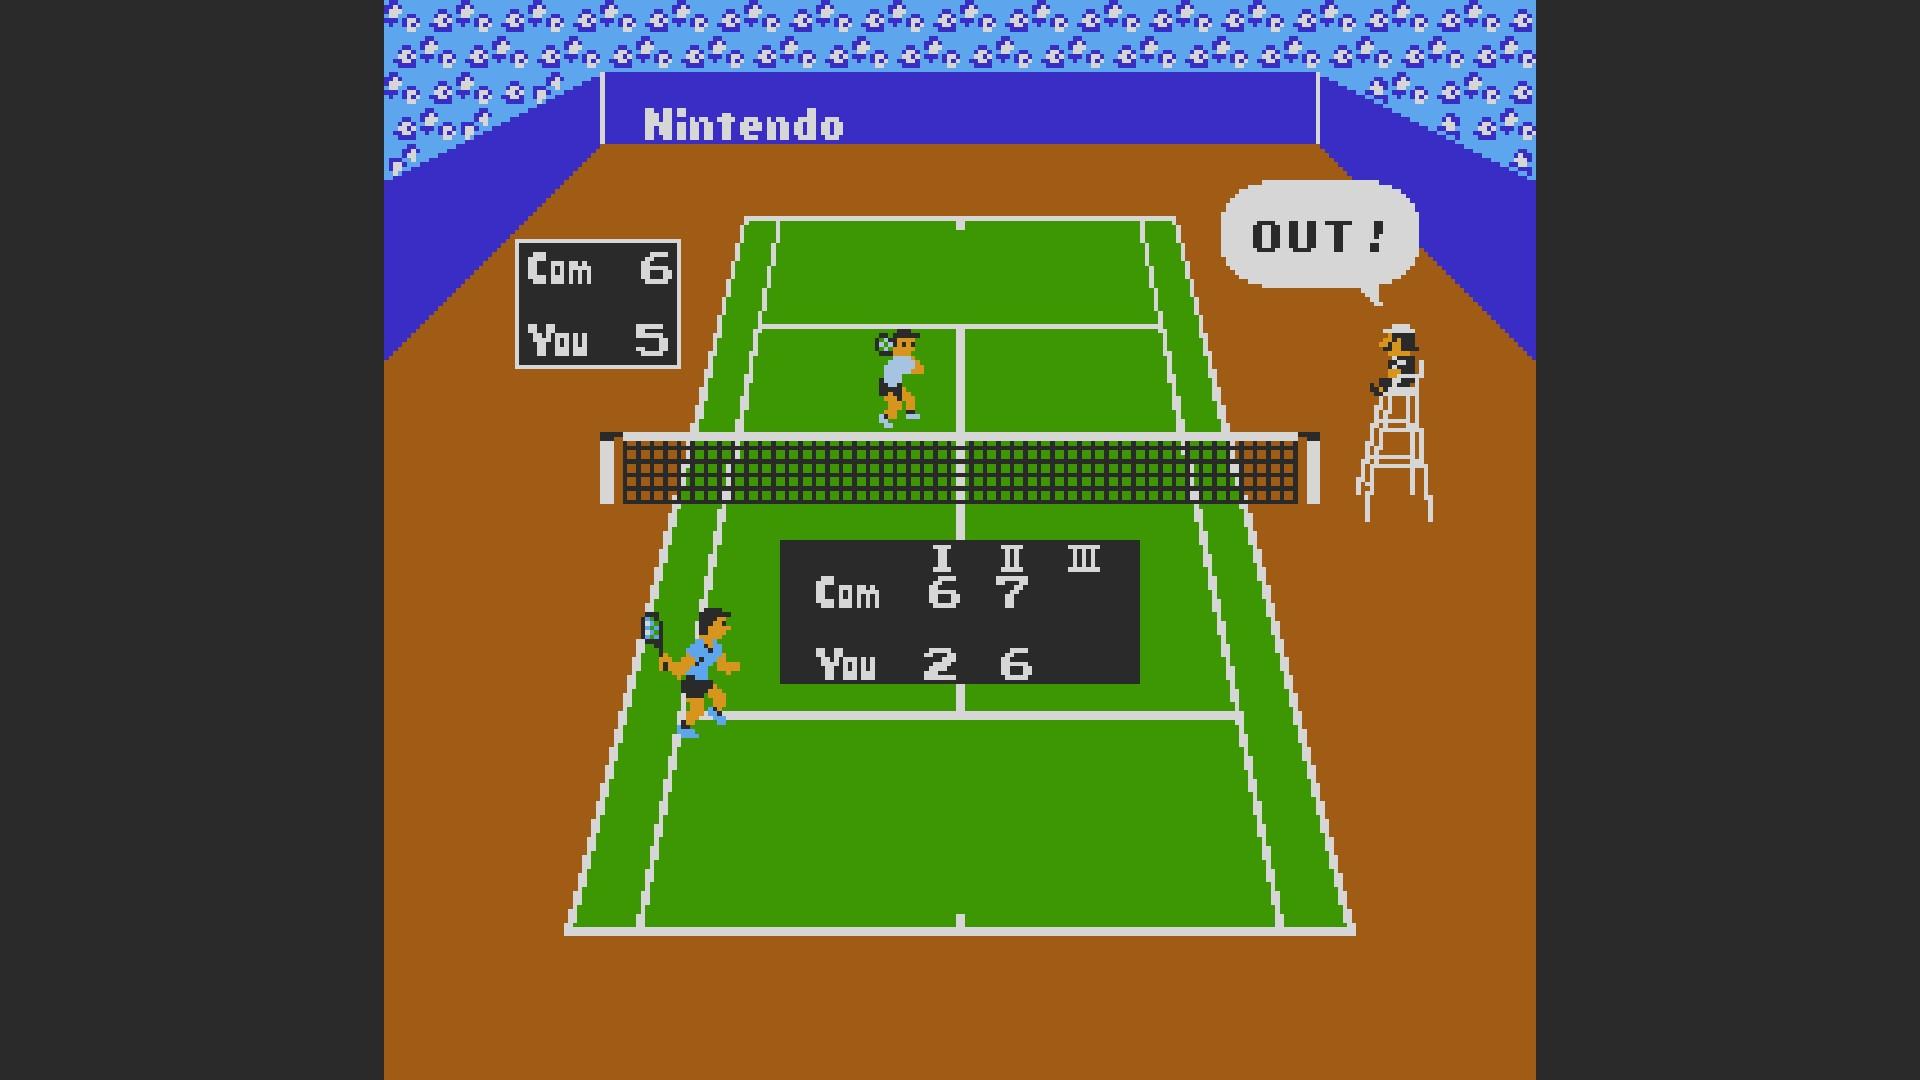 AkinNahtanoj: Tennis: Level 3 [Games Won] (NES/Famicom Emulated) 8 points on 2020-09-23 12:28:13